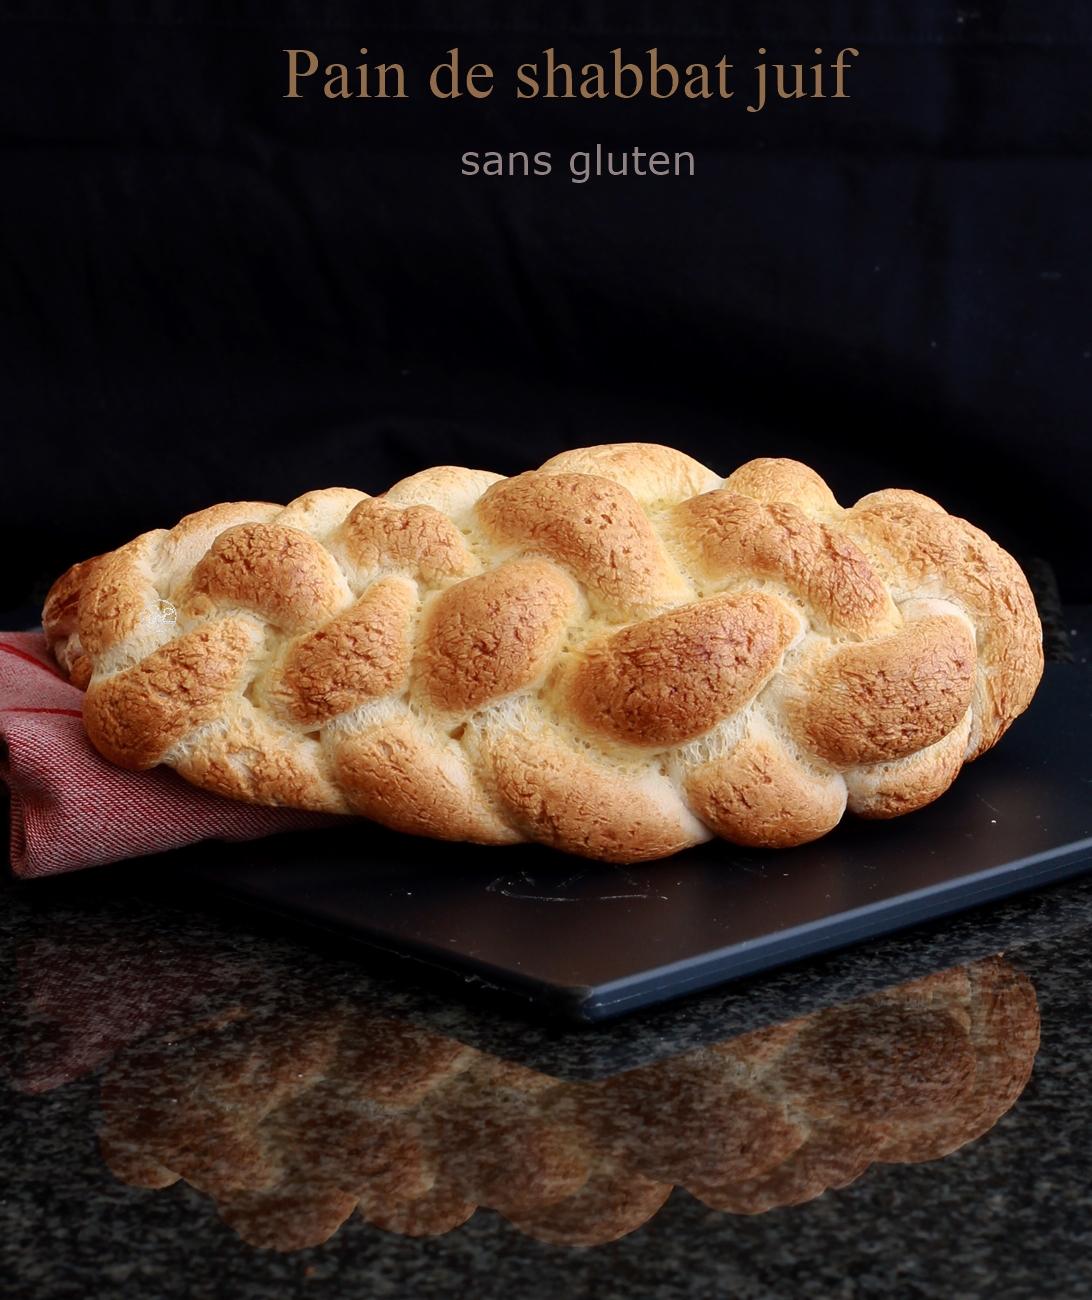 Pain du shabbat juif sans gluten - La Cassata Celiaca